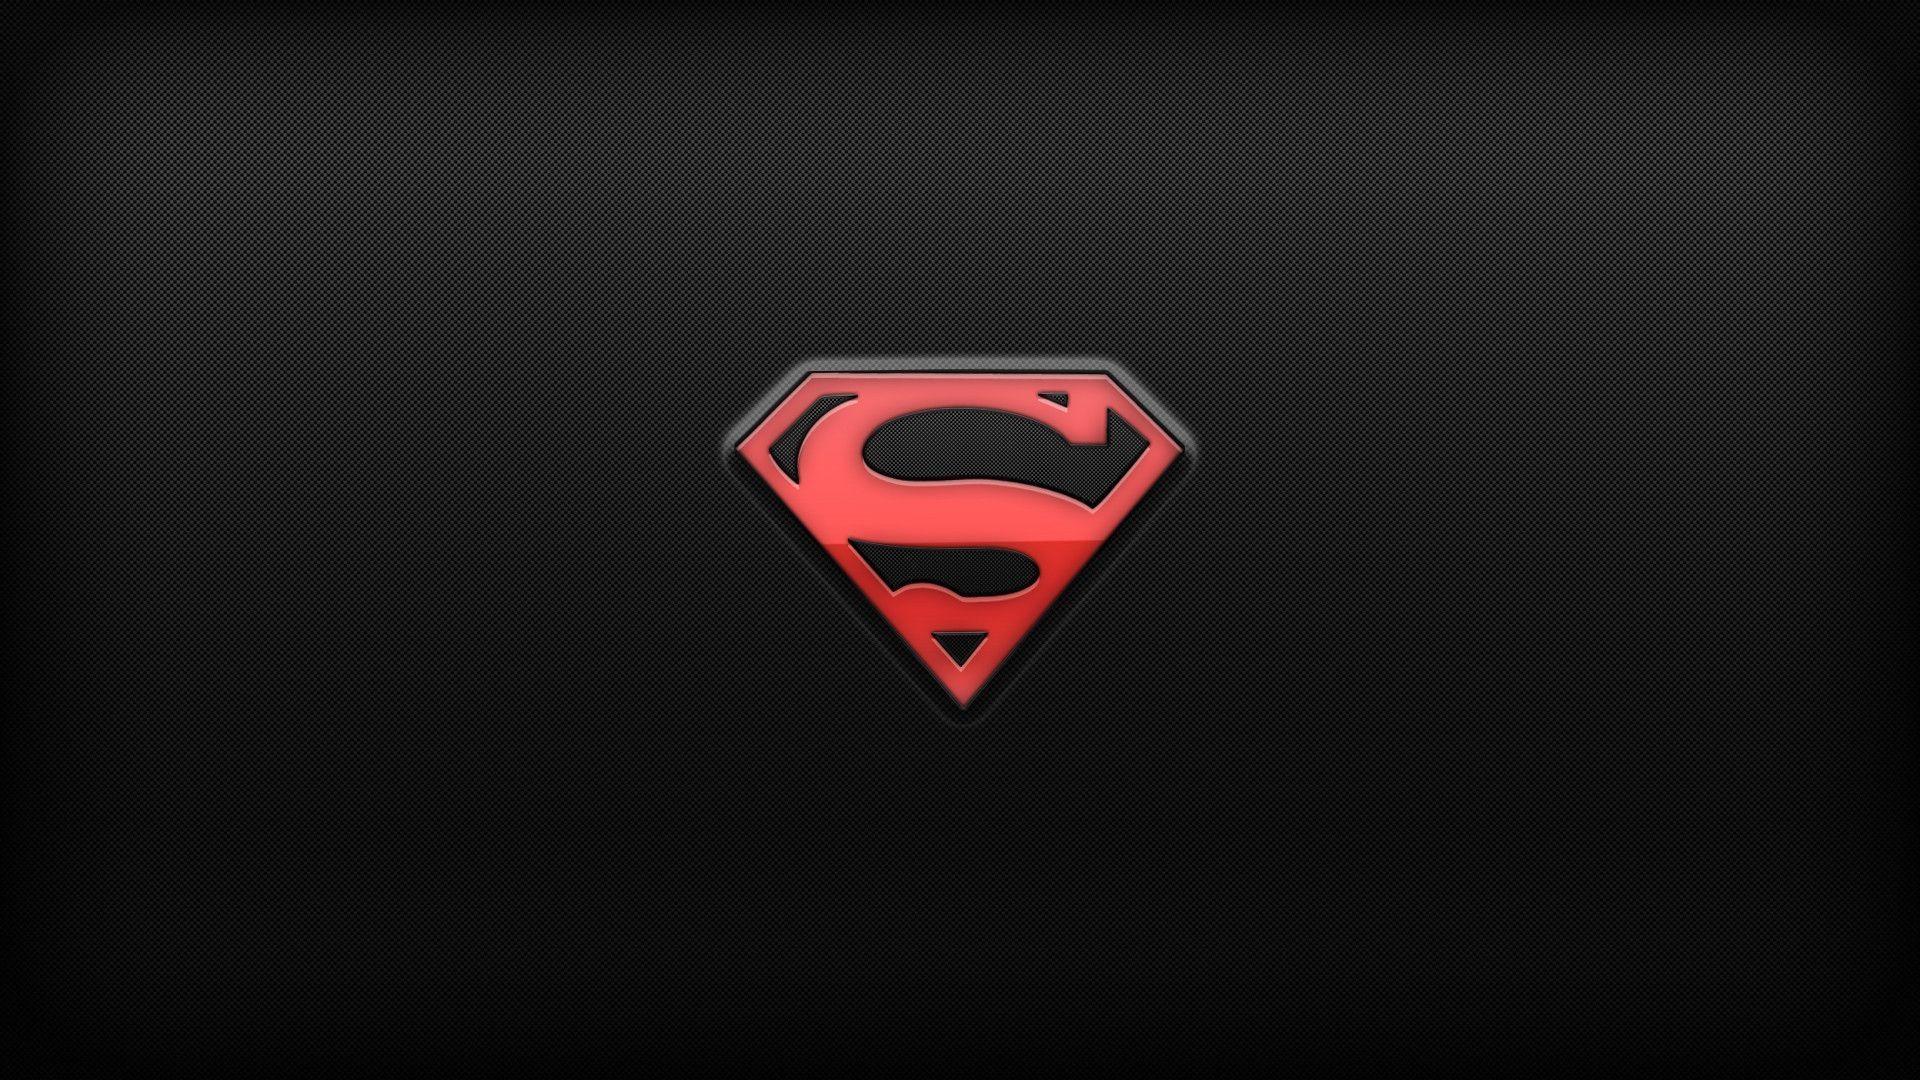 Free Download Batman IPhone Wallpaper Source Cool Superman 65 Images